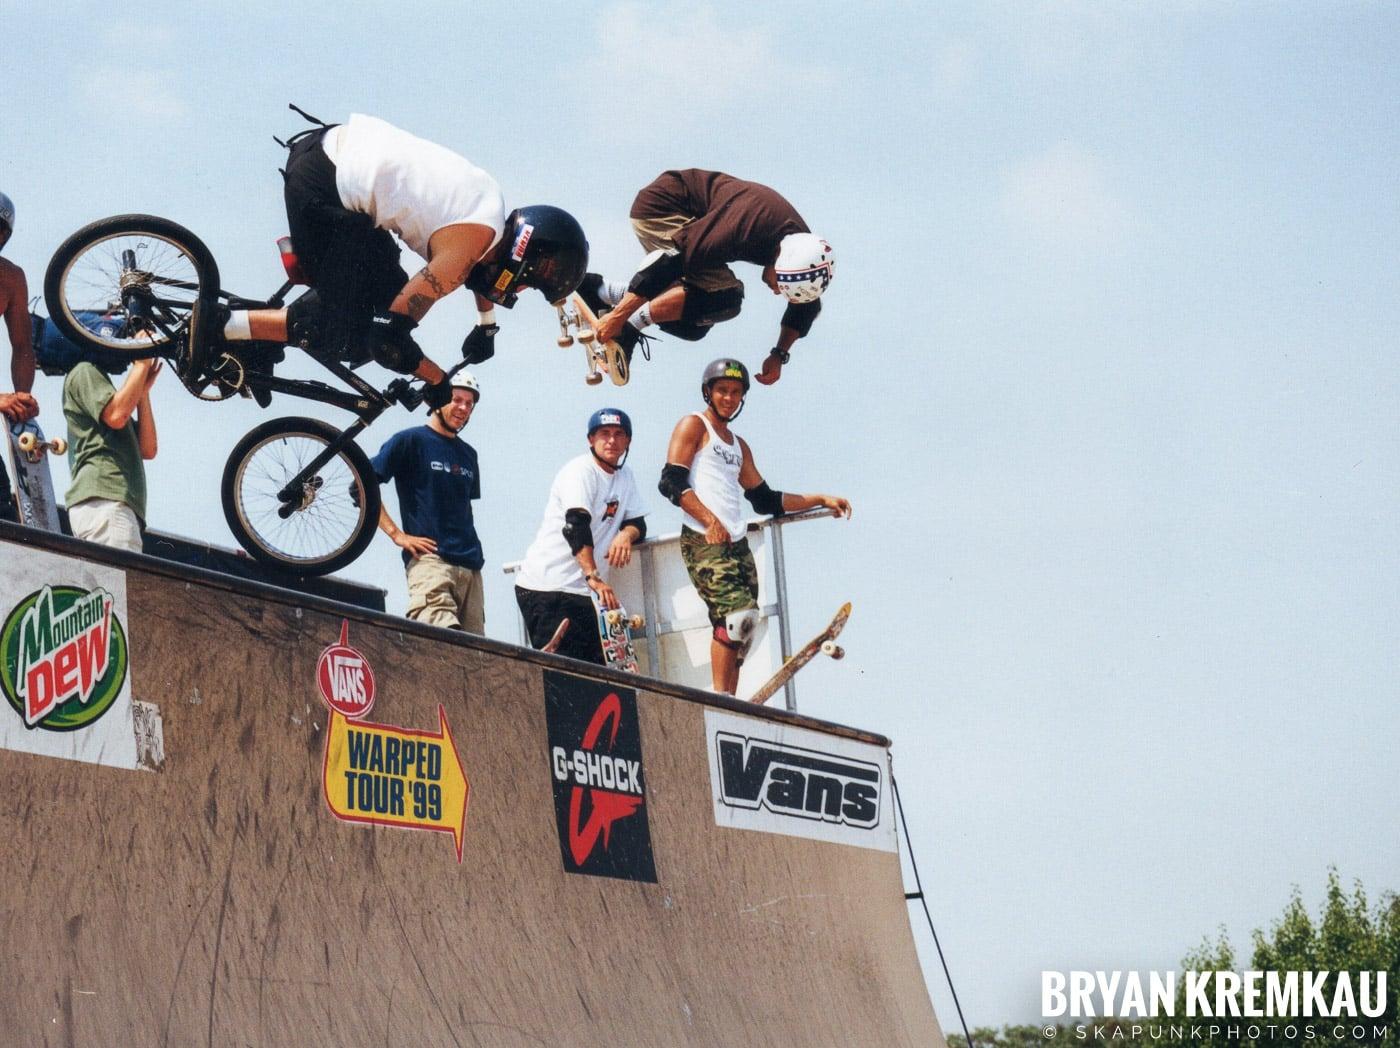 Skaters @ Vans Warped Tour, Randall's Island, NYC - 7.16.99 (3)